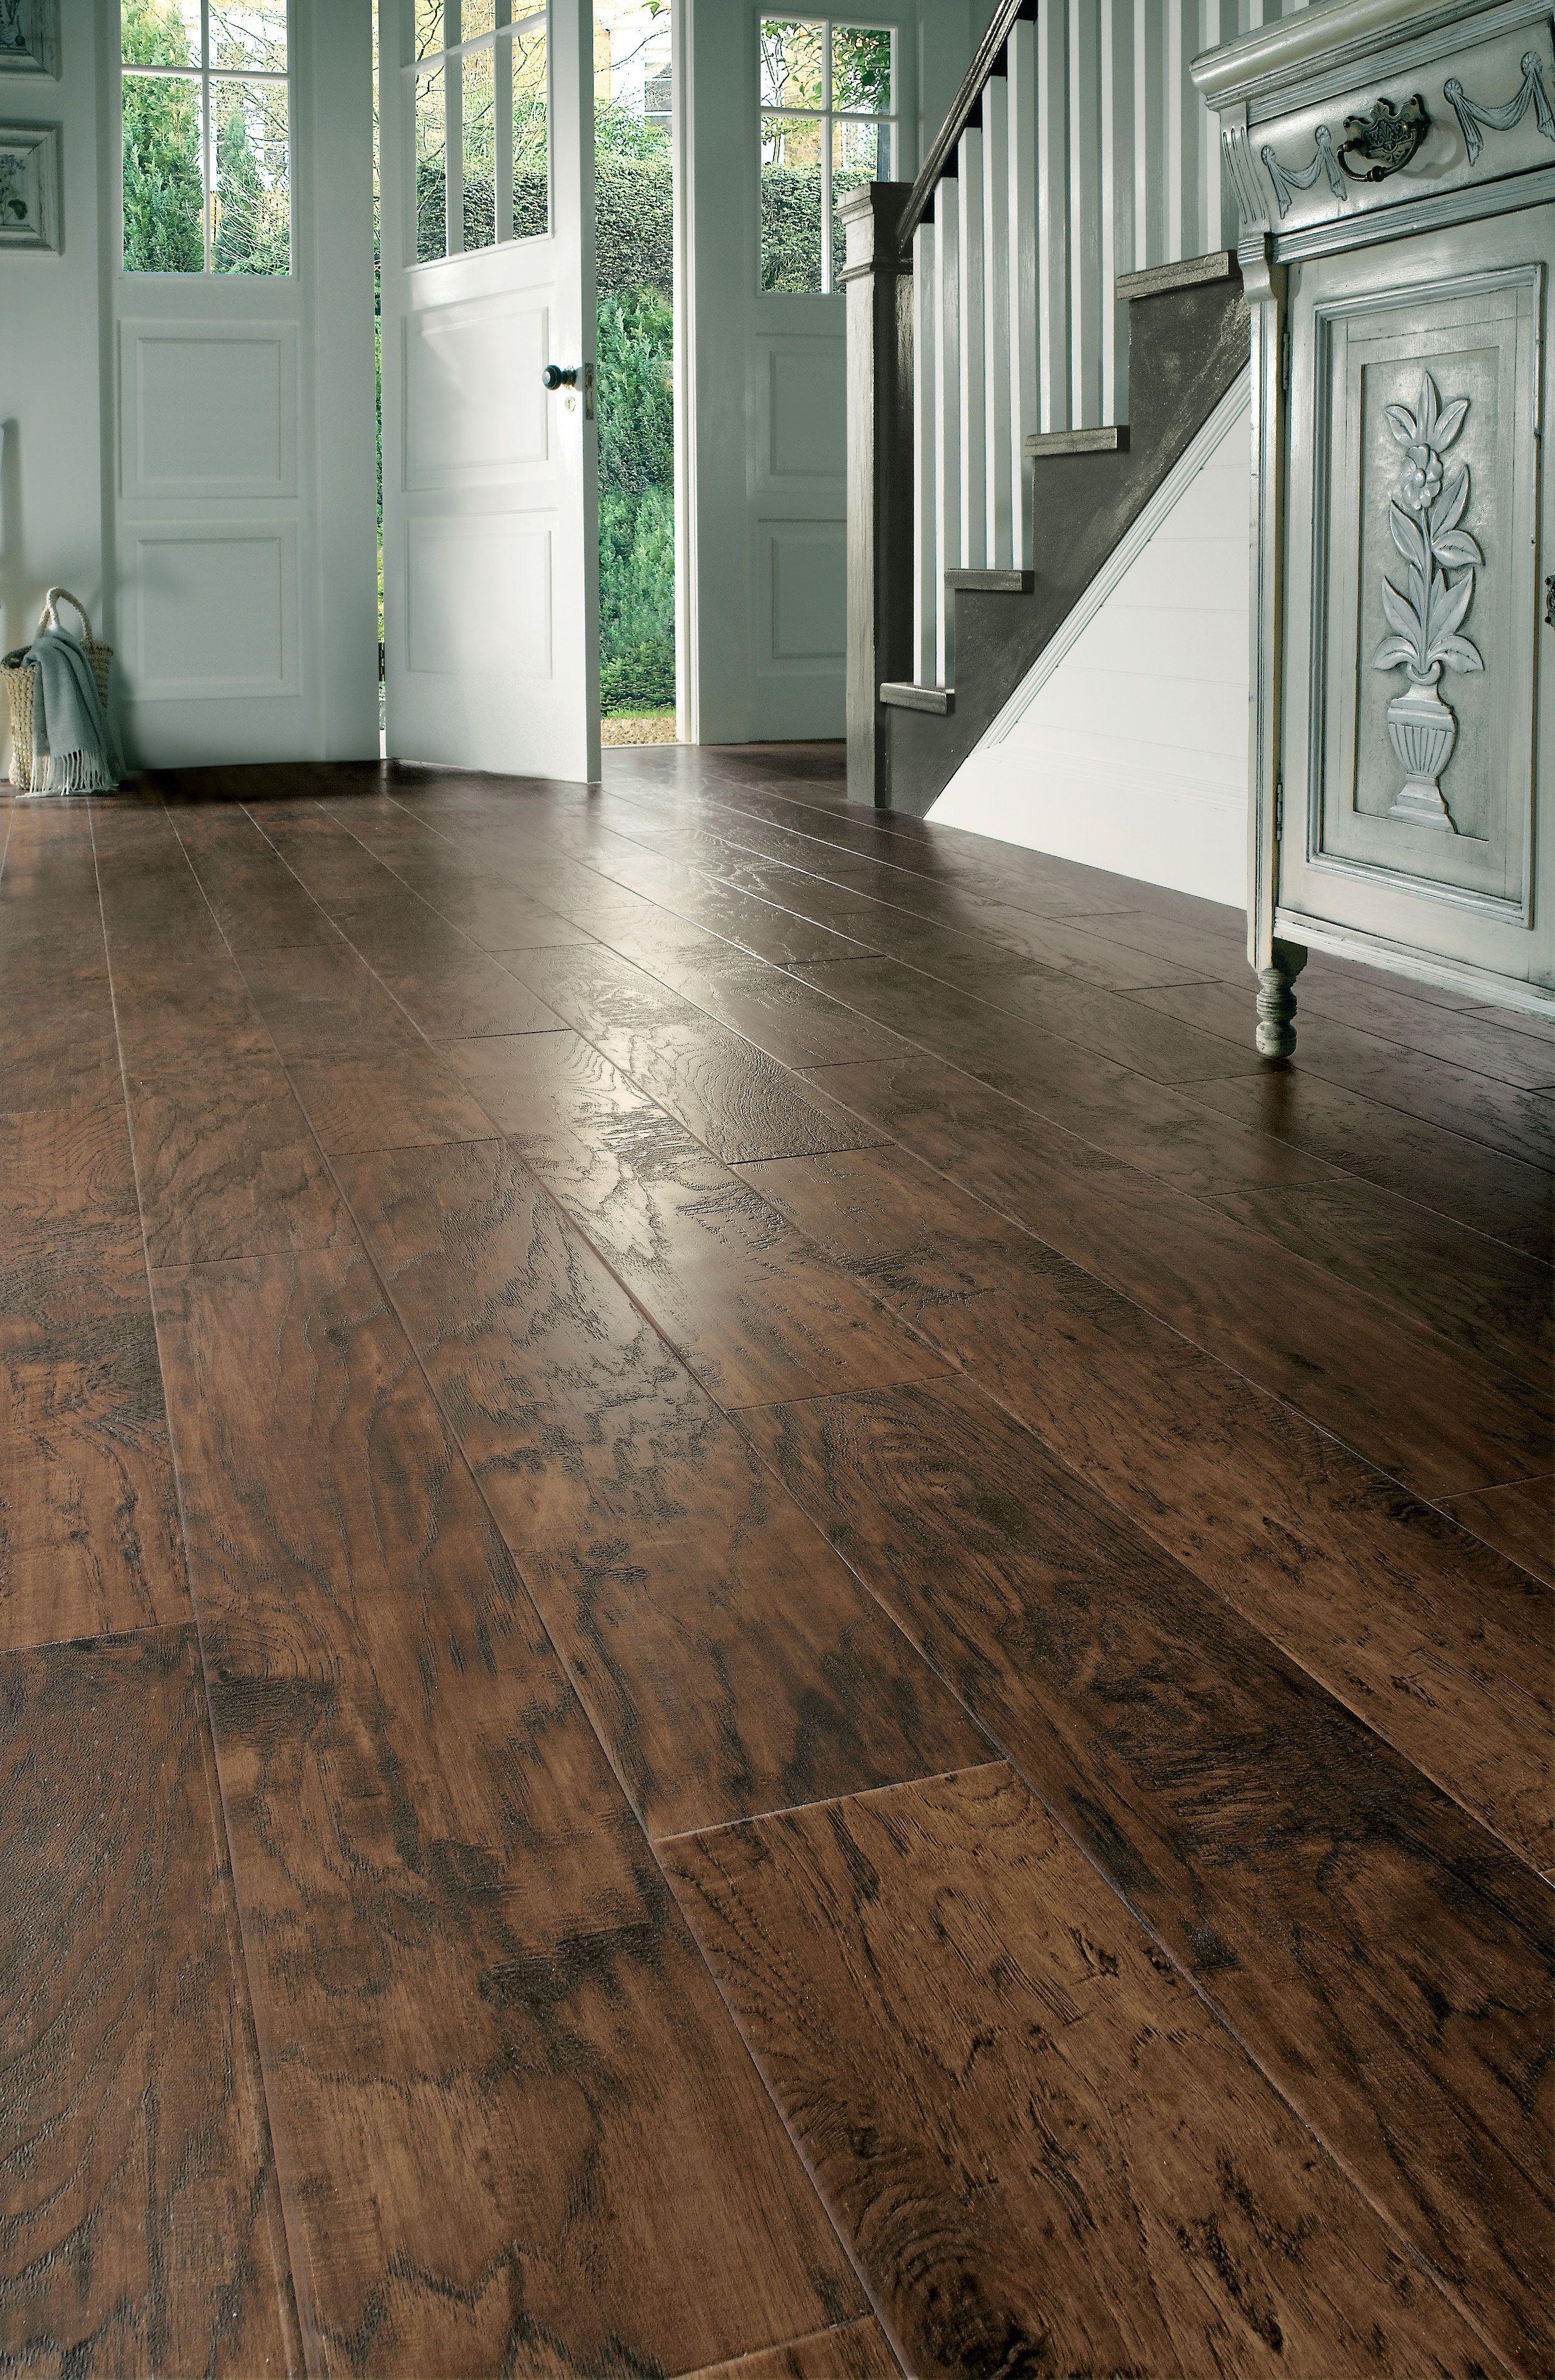 floor bolton vinyl lancashire farnworth karndean country p luxury tile manchester oak flooring in